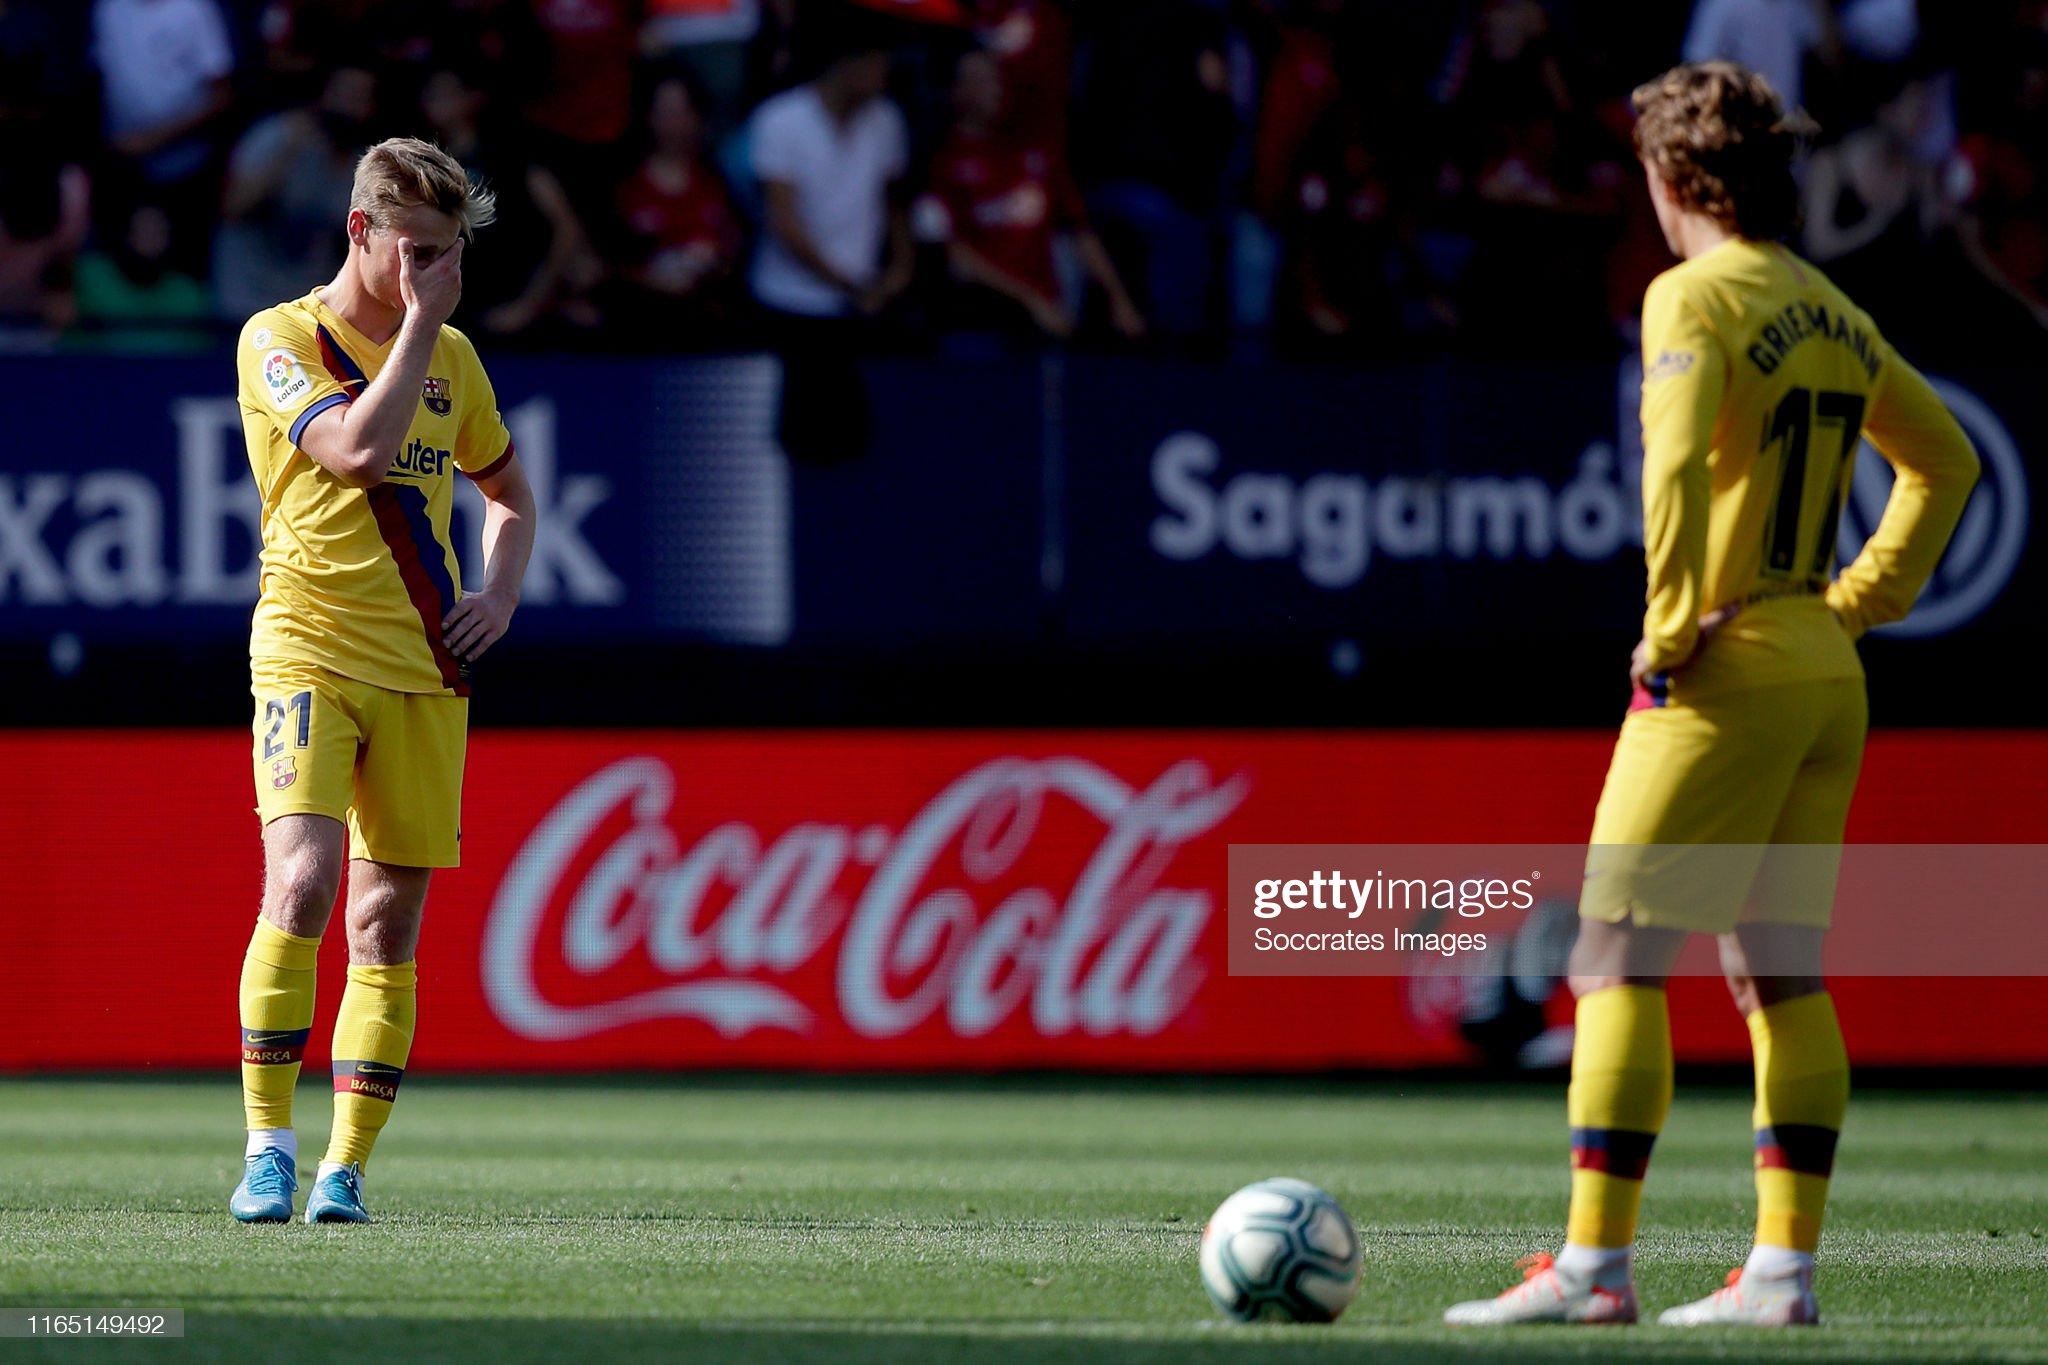 صور مباراة : أوساسونا - برشلونة 2-2 ( 31-08-2019 )  Frenkie-de-jong-of-fc-barcelona-during-the-la-liga-santander-match-picture-id1165149492?s=2048x2048